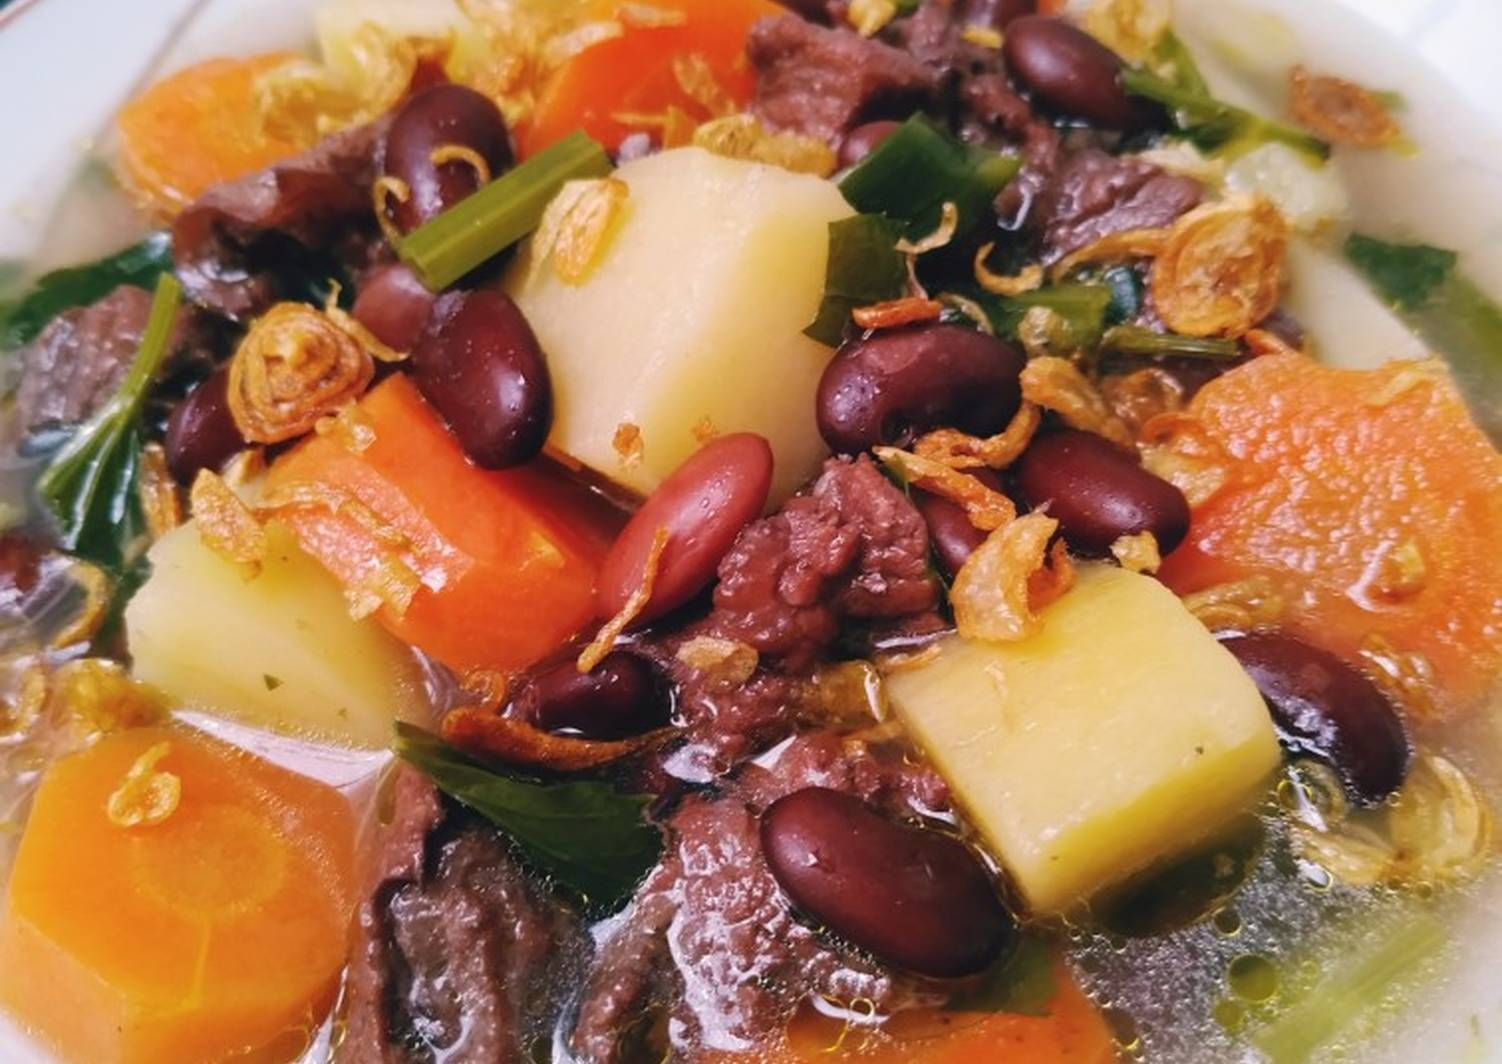 Resep Sayur Sop Kacang Merah Oleh Tyas Widiastuti Resep Kacang Merah Kacang Resep